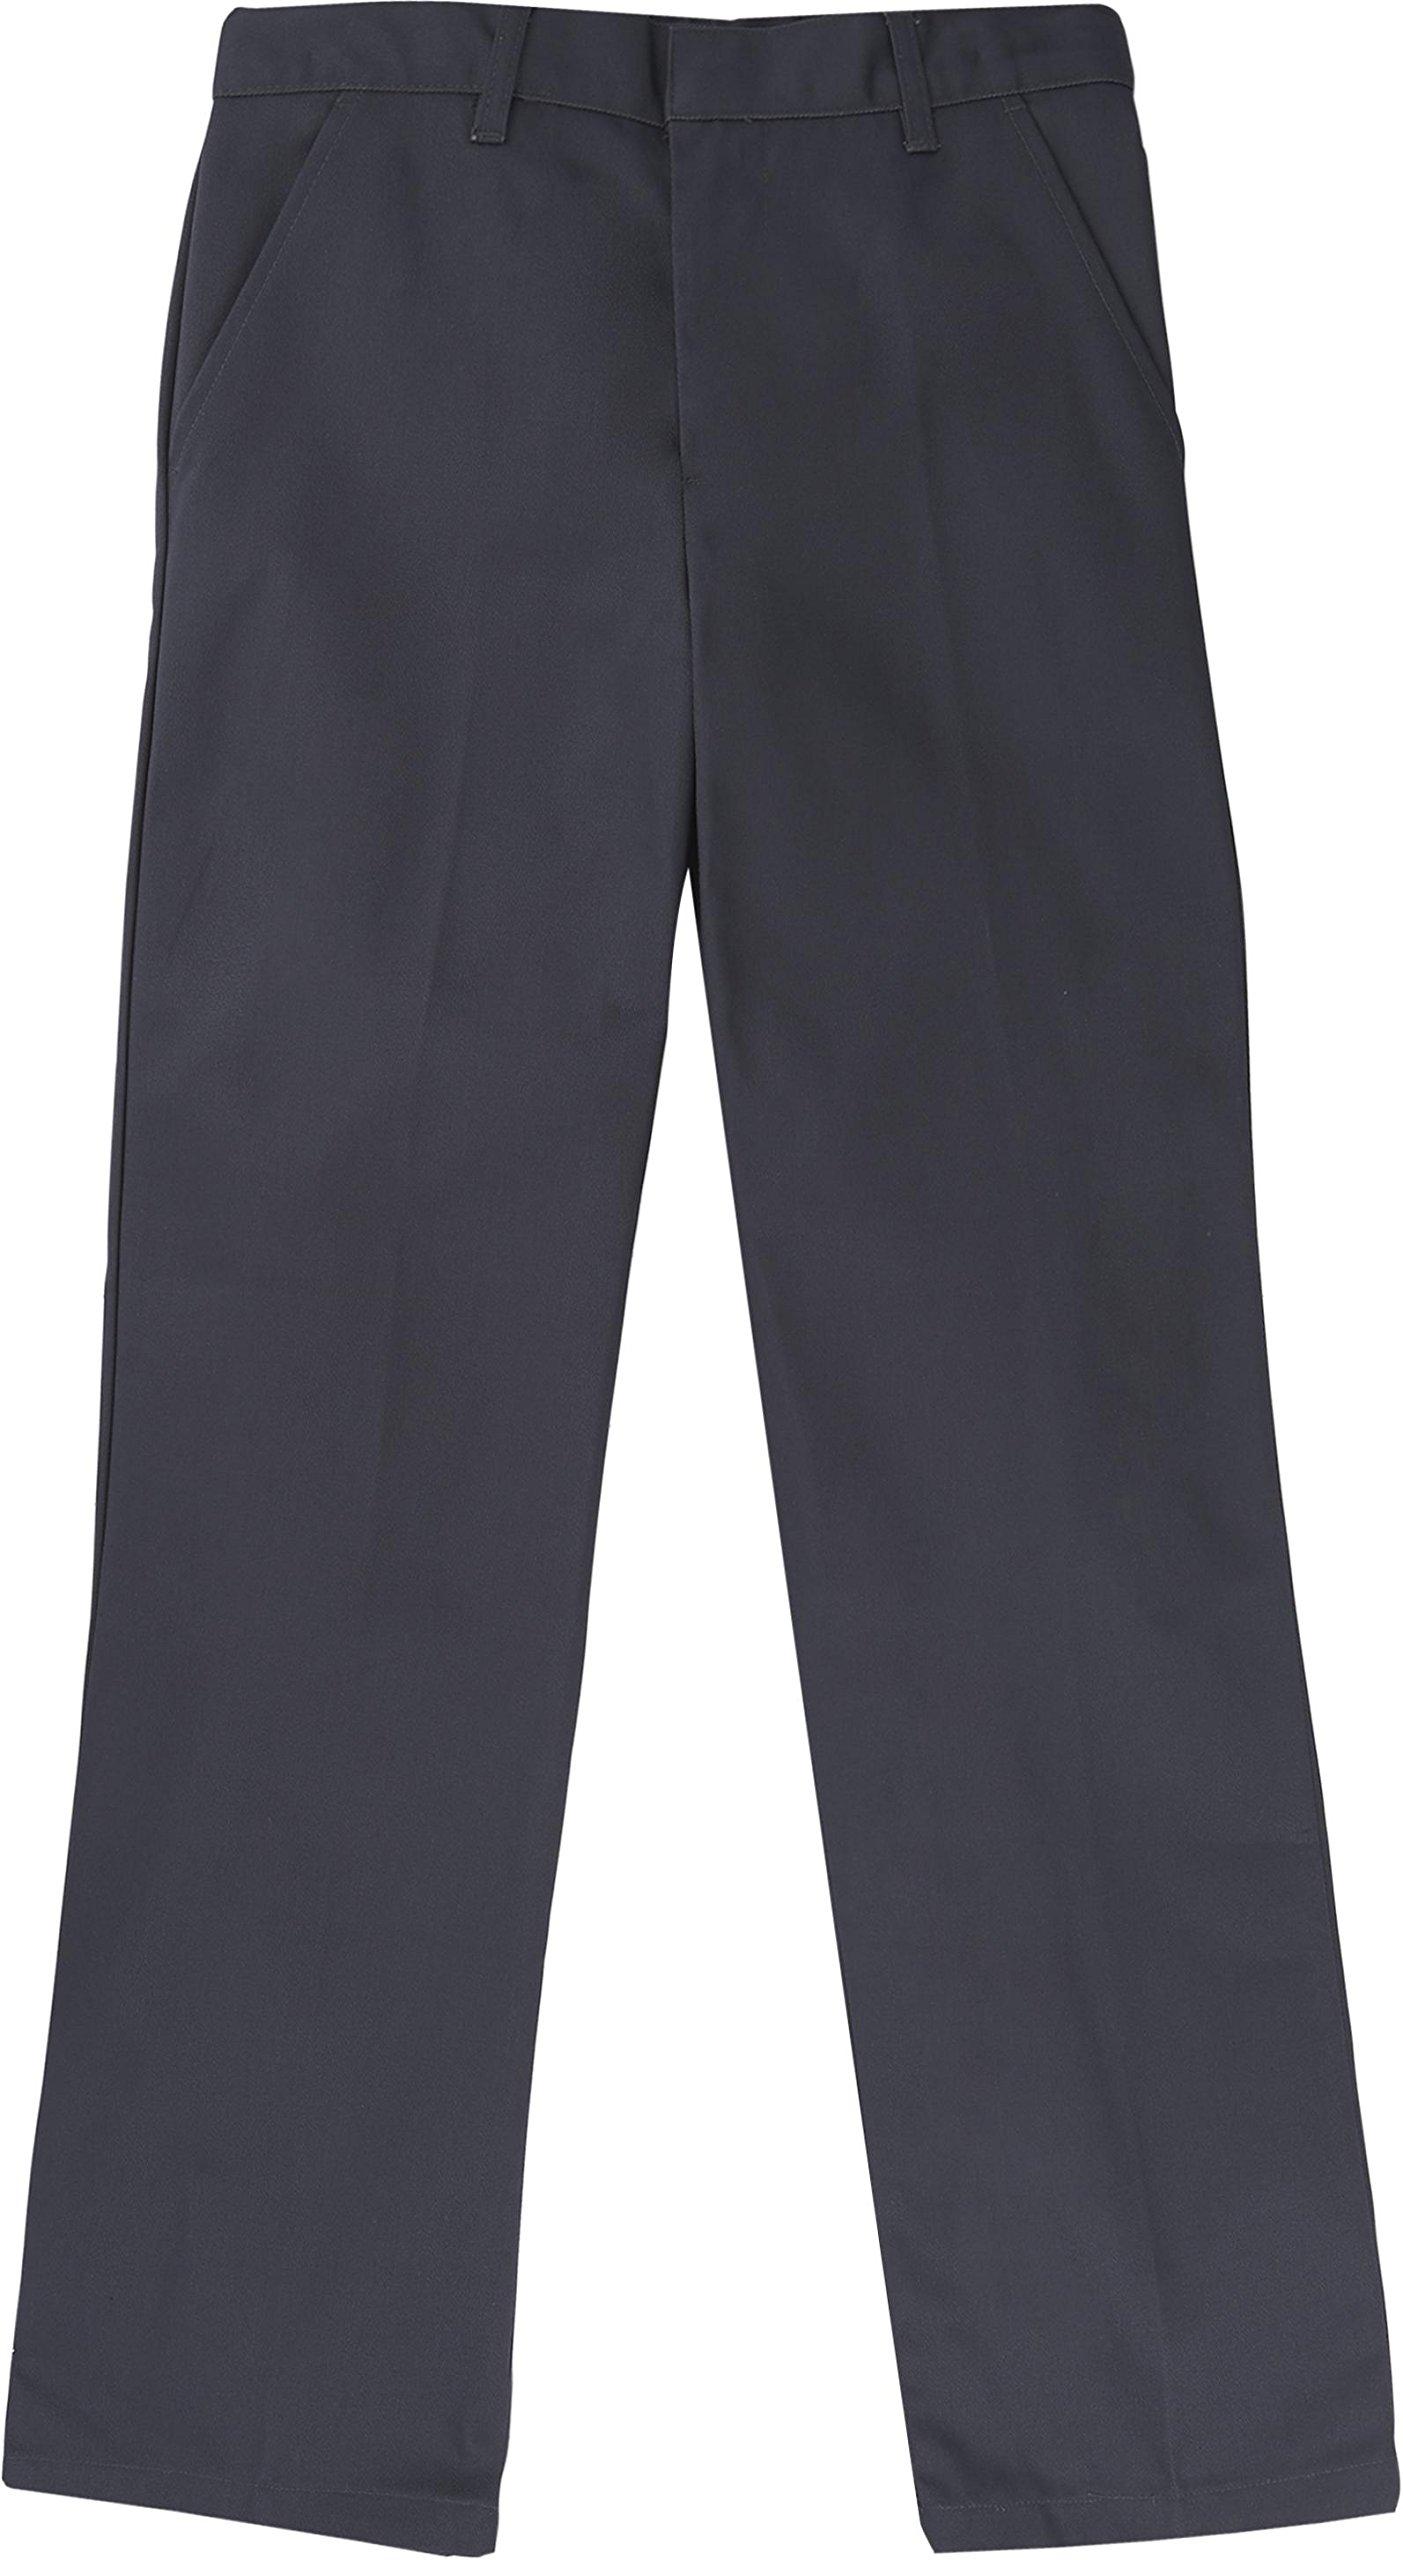 French Toast School Uniform Boys Adjustable Waist Flat Front Workwear Finish Double Knee Pants, Gray, 14 Slim